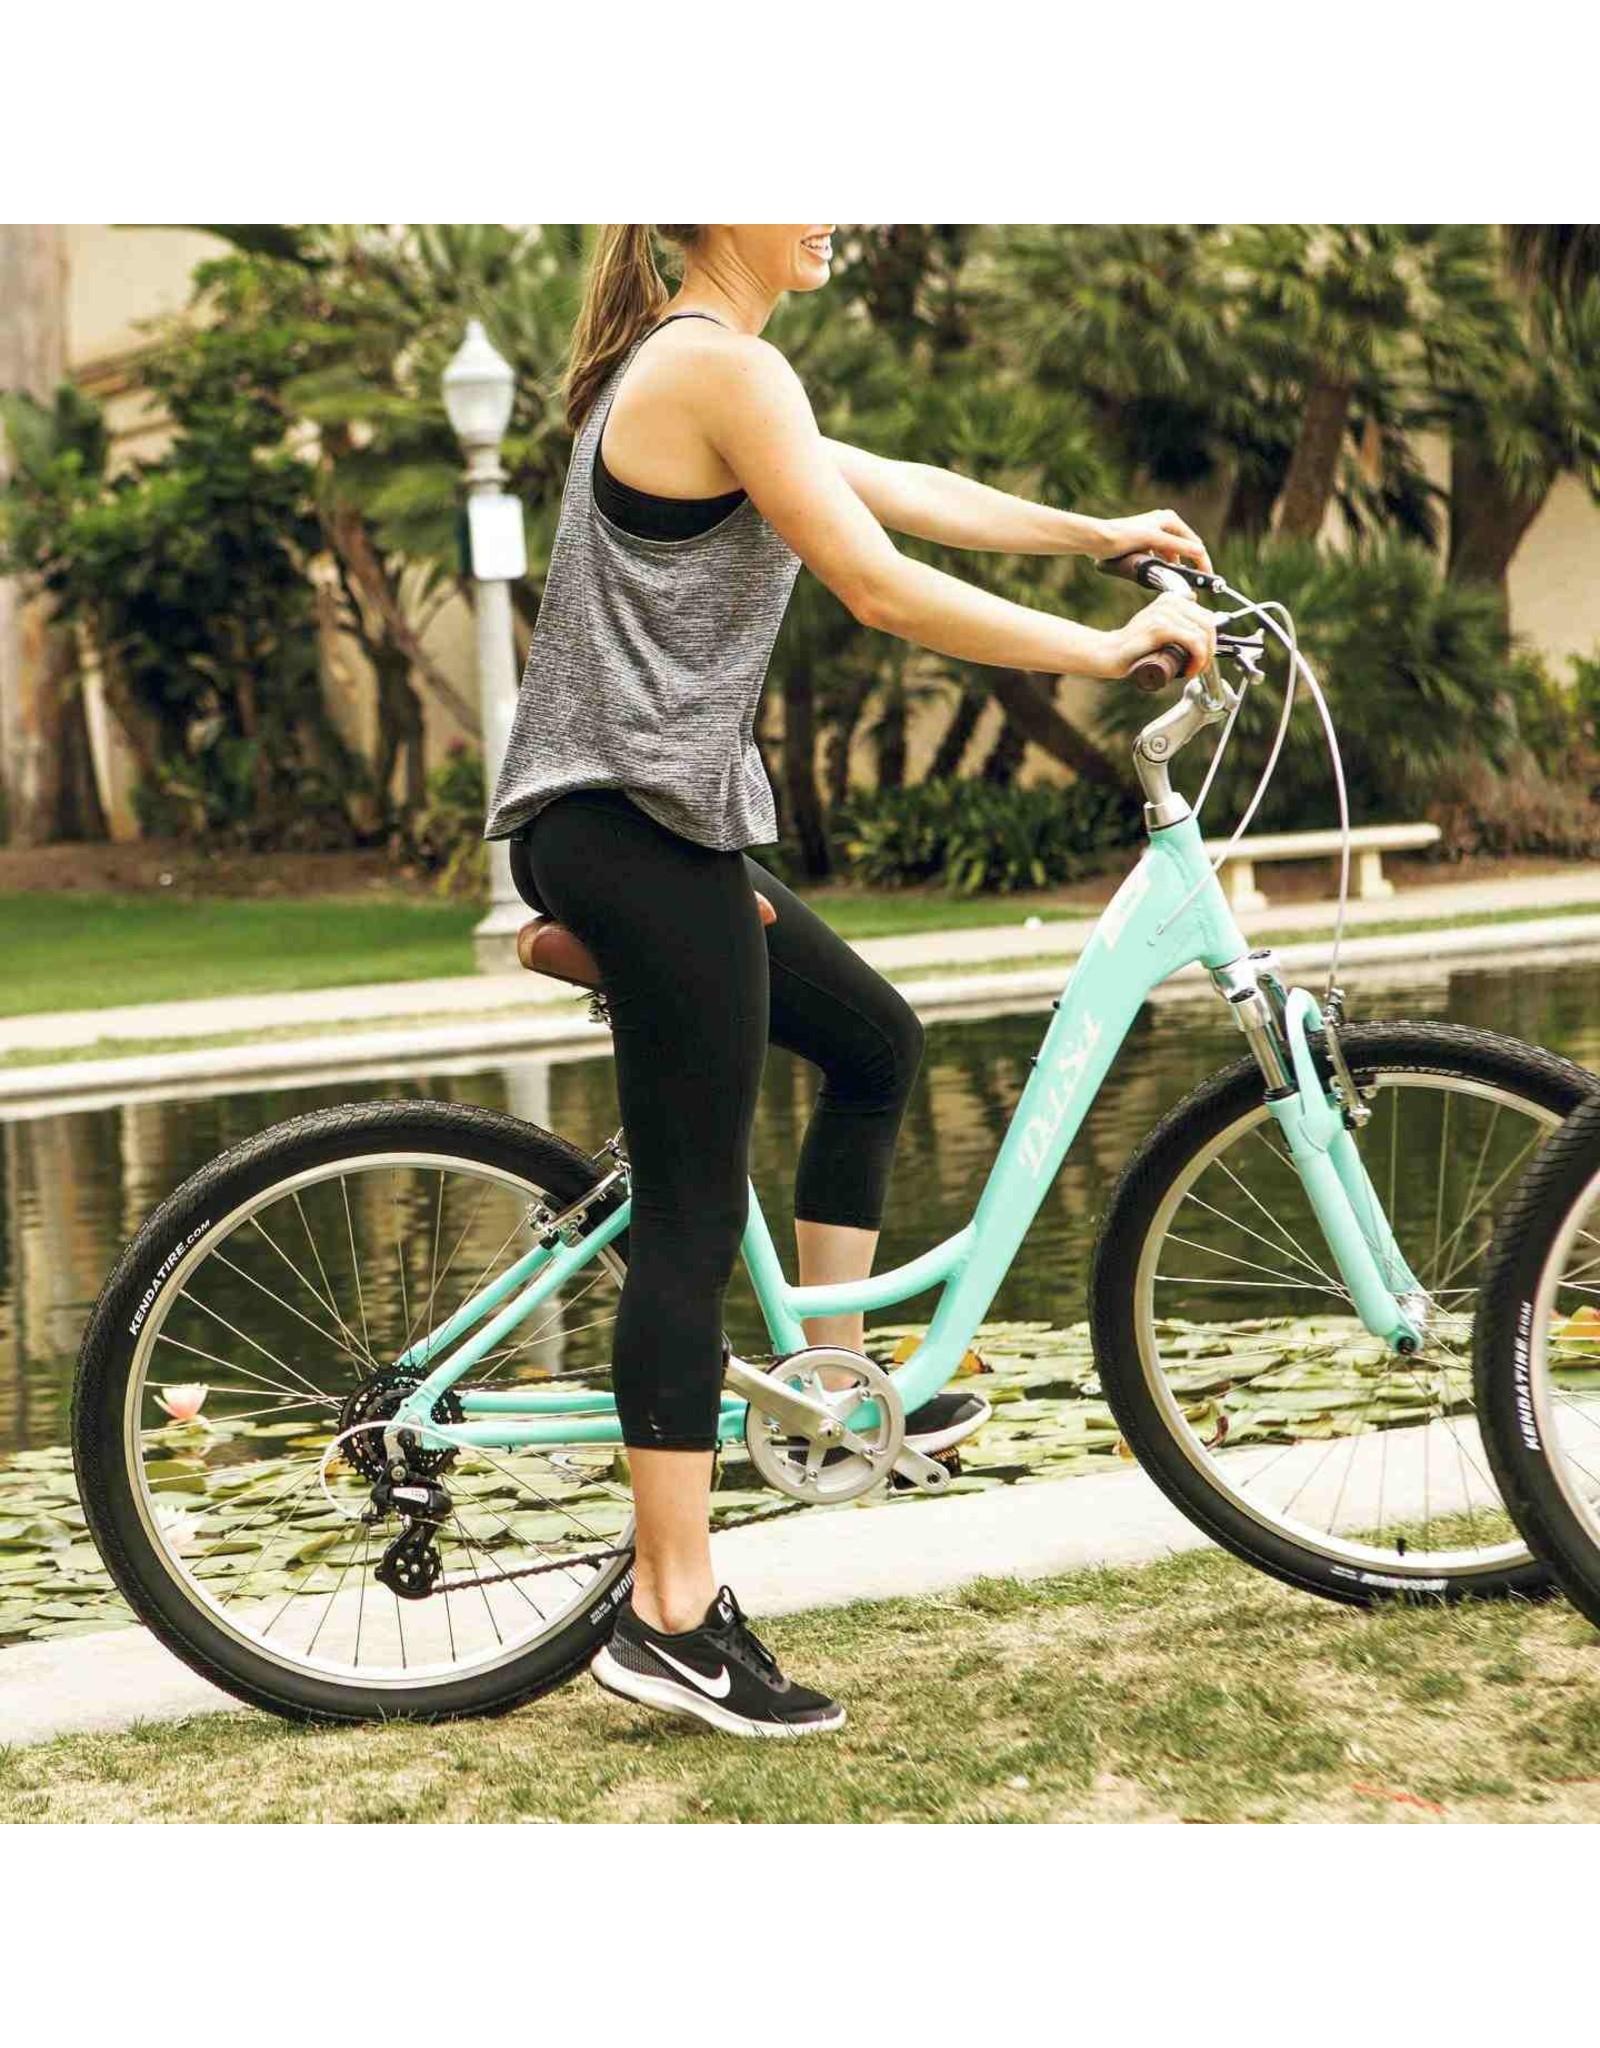 DEL SOL DEL SOL LXI FLOW2 ST Limpet Shell hybrid bike